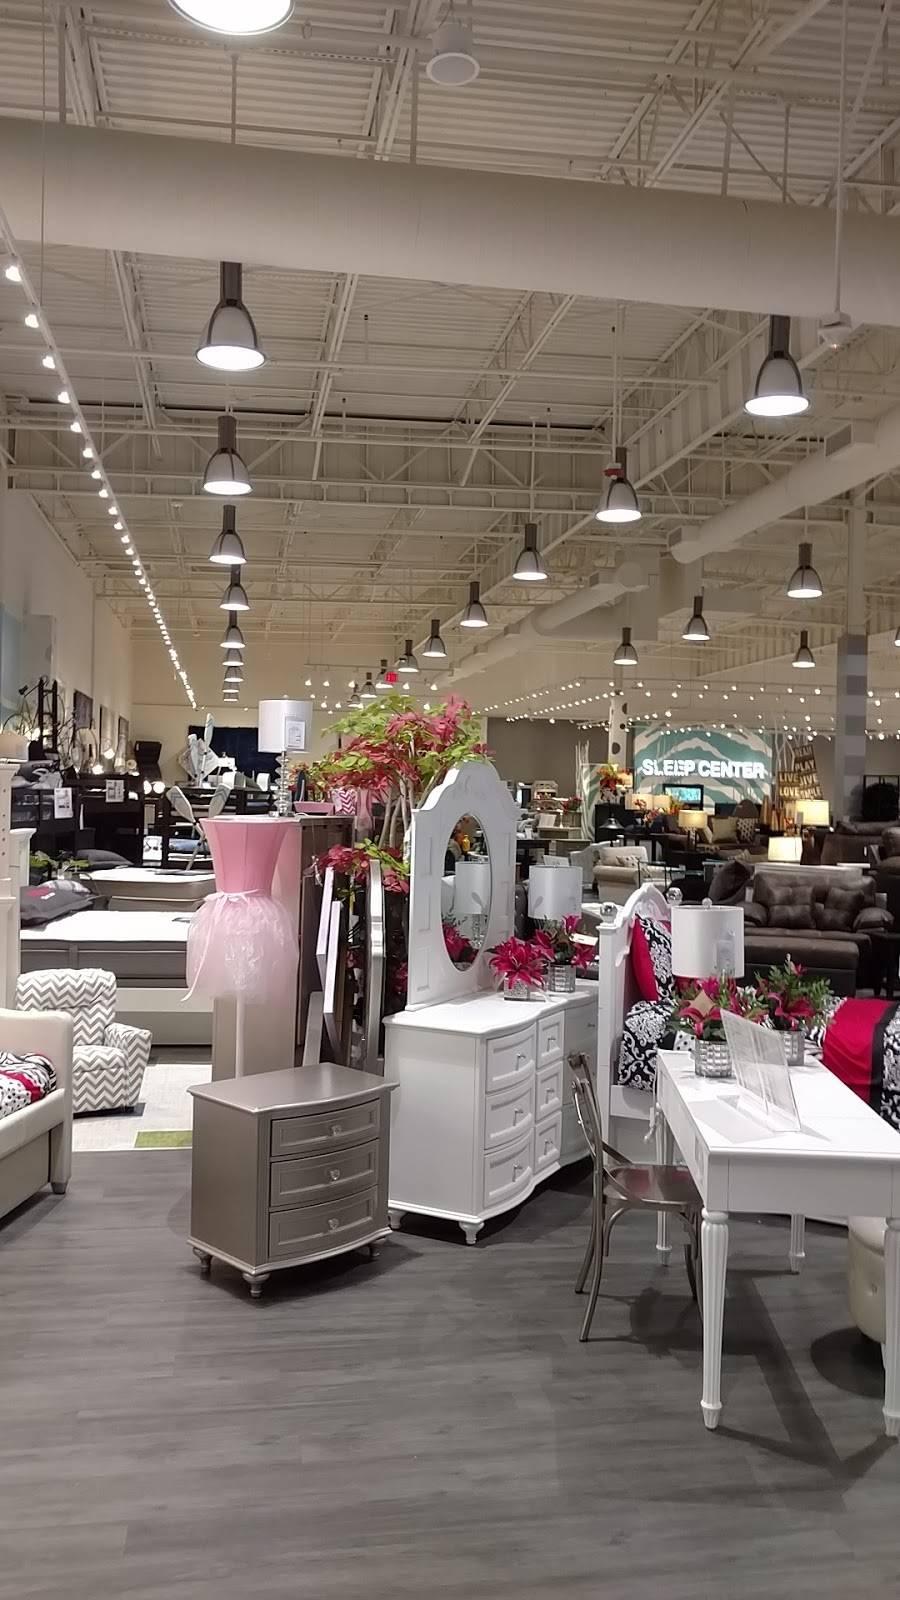 Bob's Discount Furniture and Mattress Store - furniture store  | Photo 7 of 9 | Address: 7440 Carson Blvd, Long Beach, CA 90808, USA | Phone: (562) 548-1557